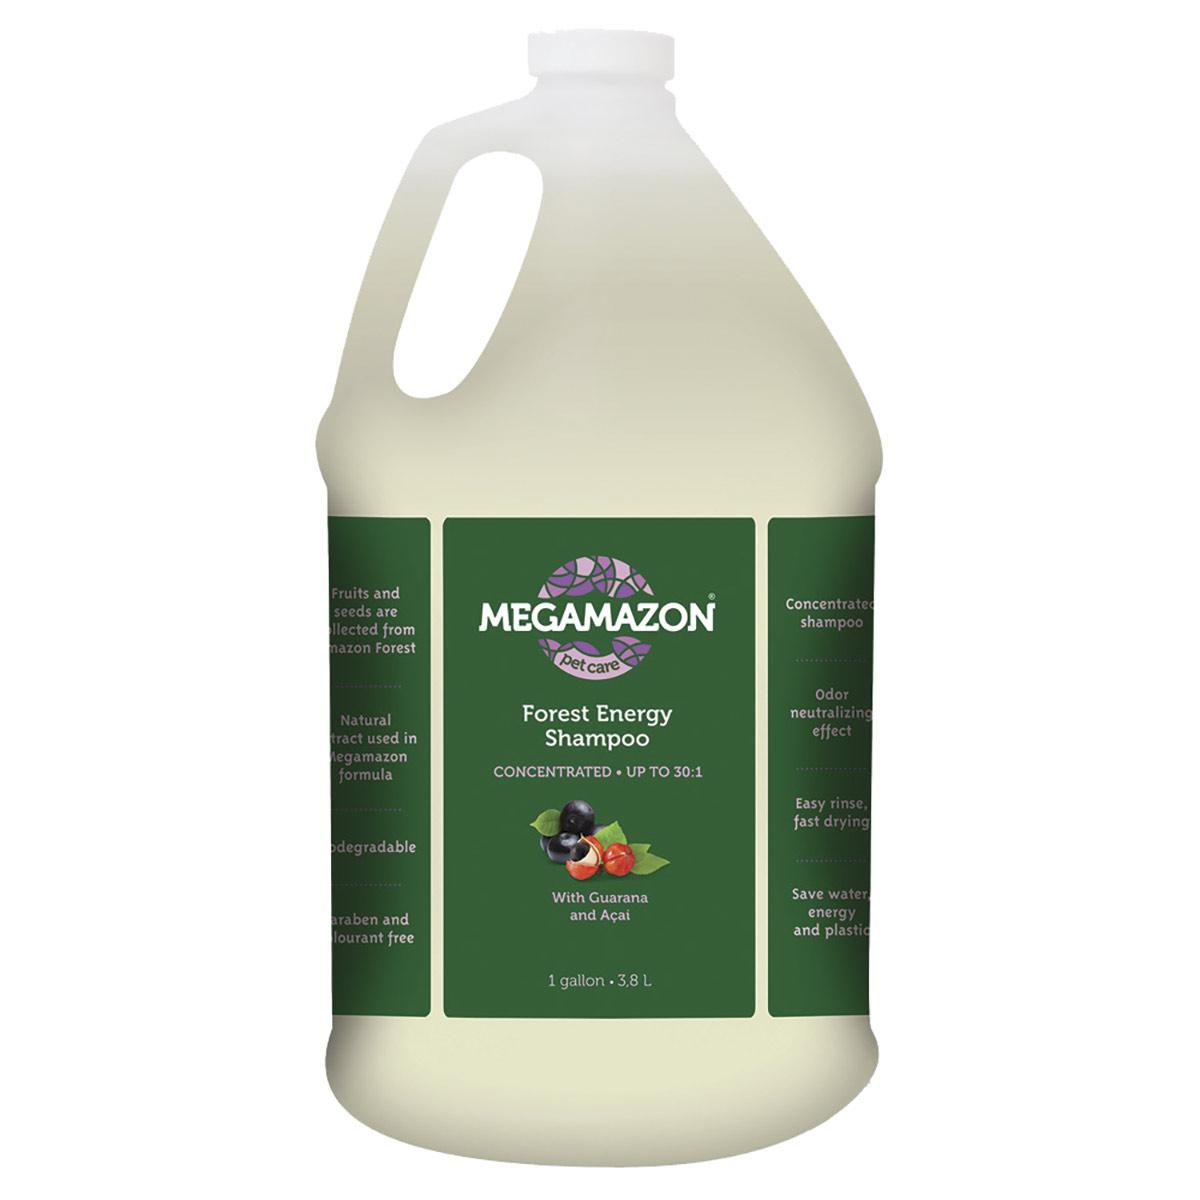 Buy Megamazon Forest Energy Shampoo Gallon 30:1